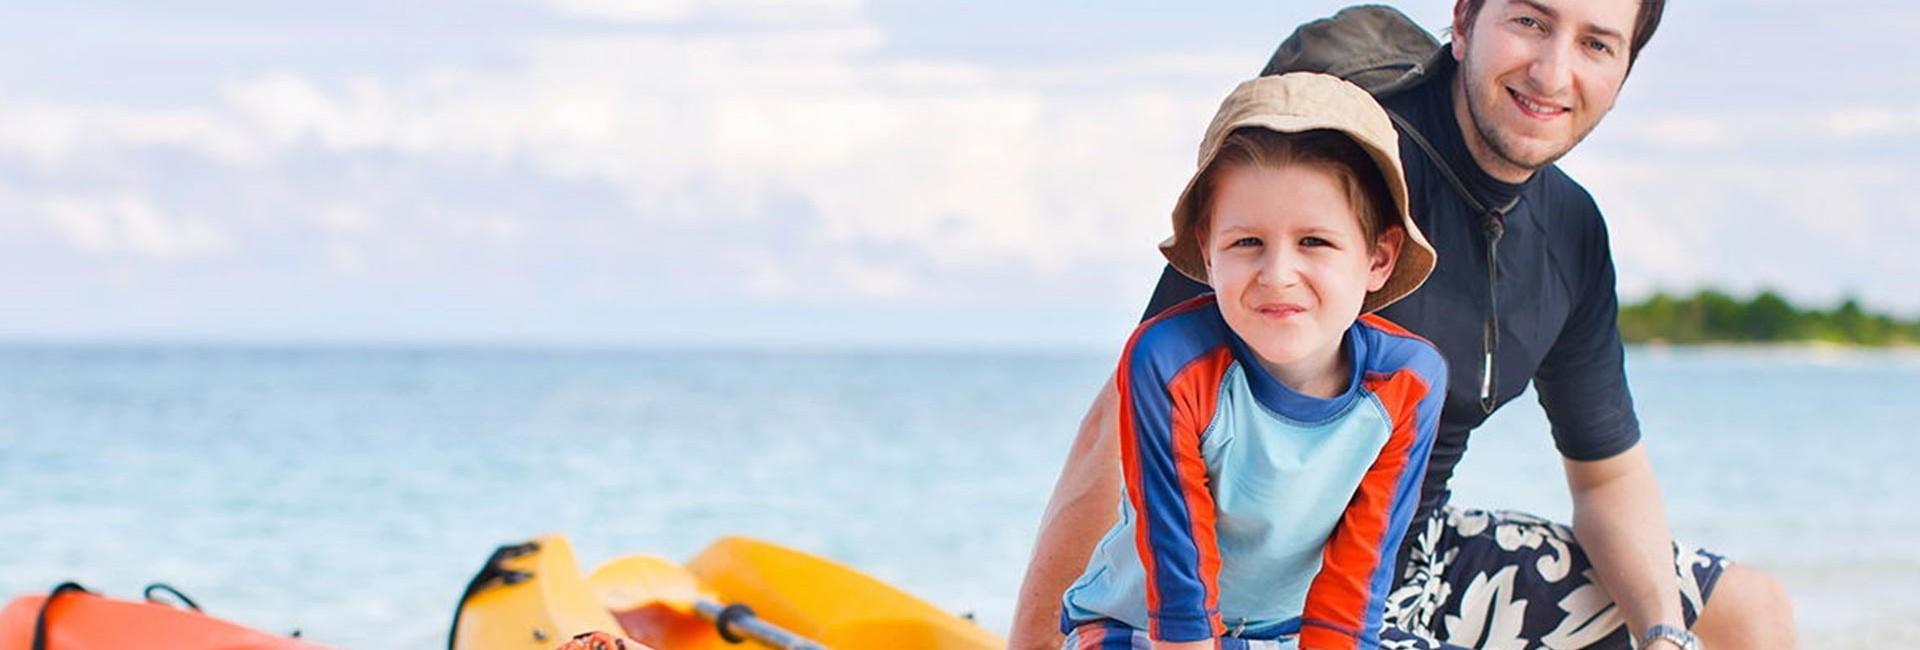 Kayak Rentals West Palm Beach Florida